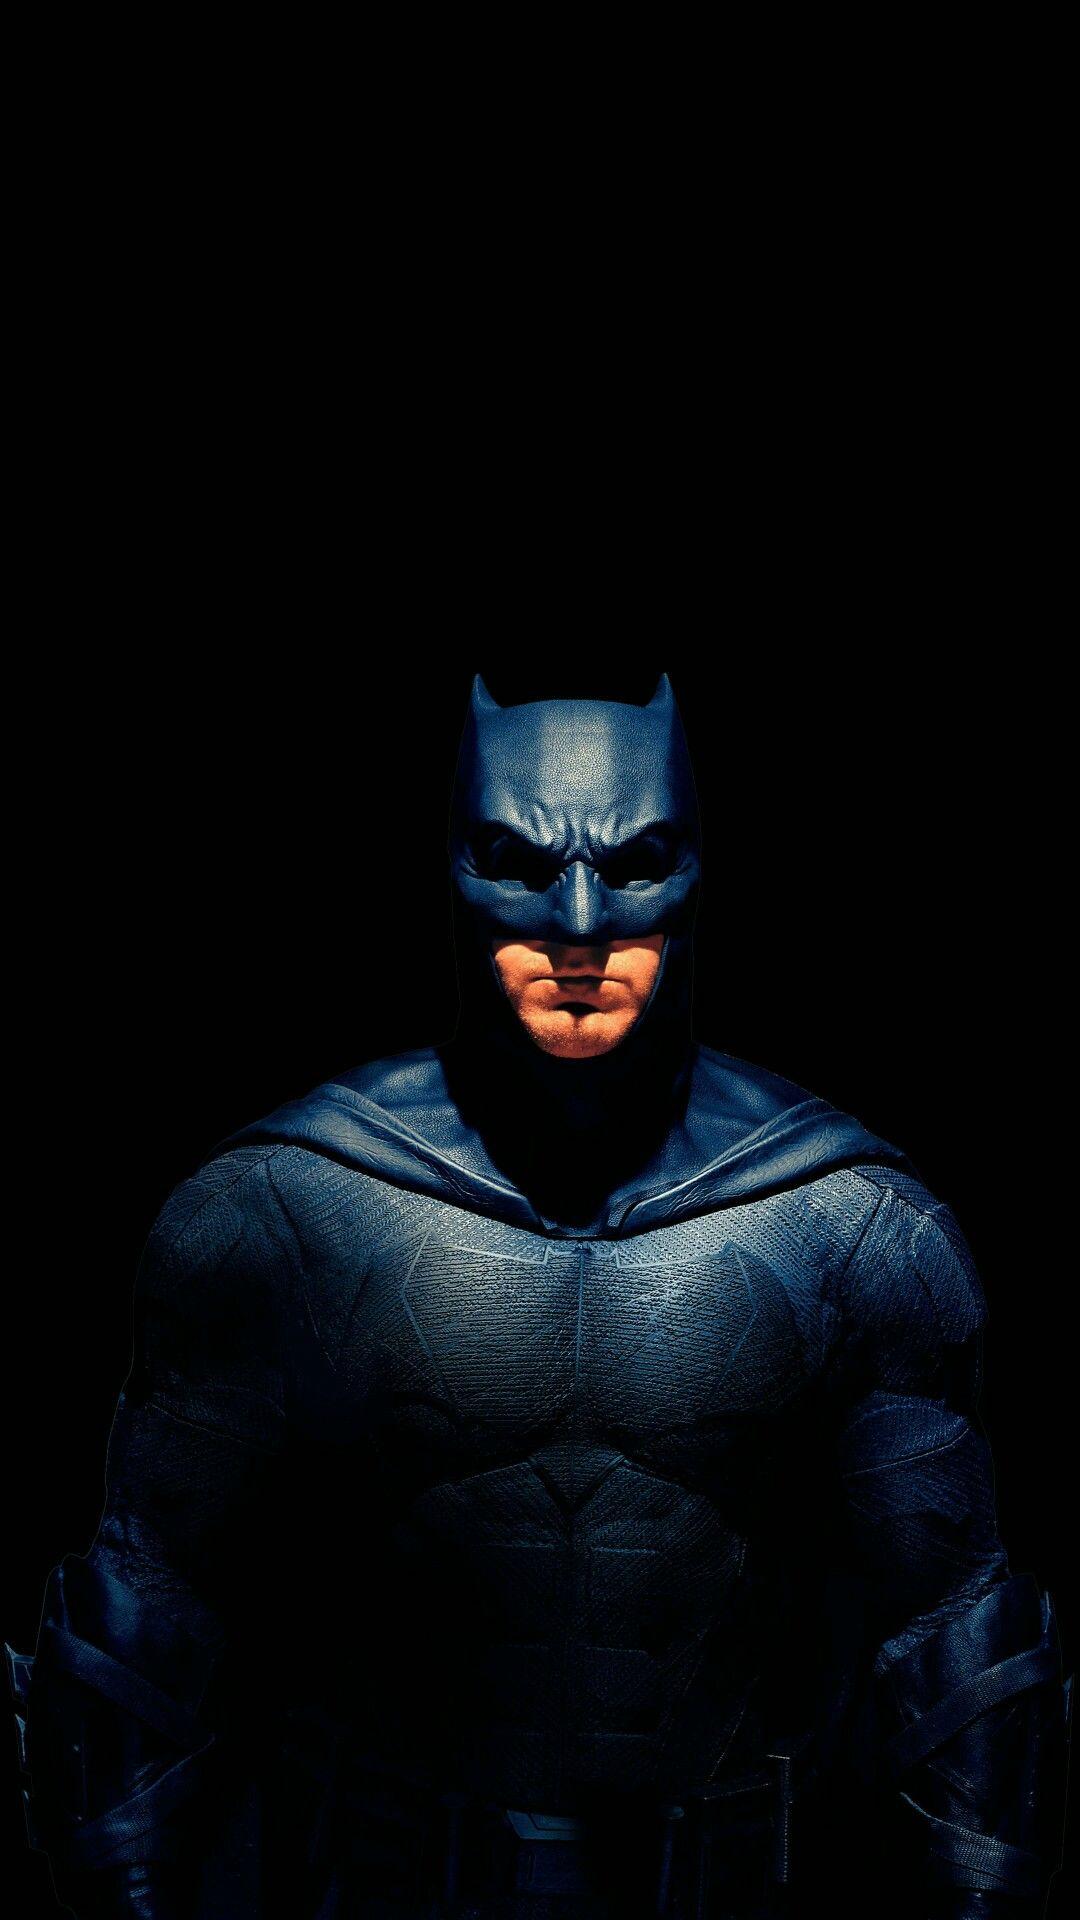 4K Batman Wallpaper Batman wallpaper, Batman, Hd batman